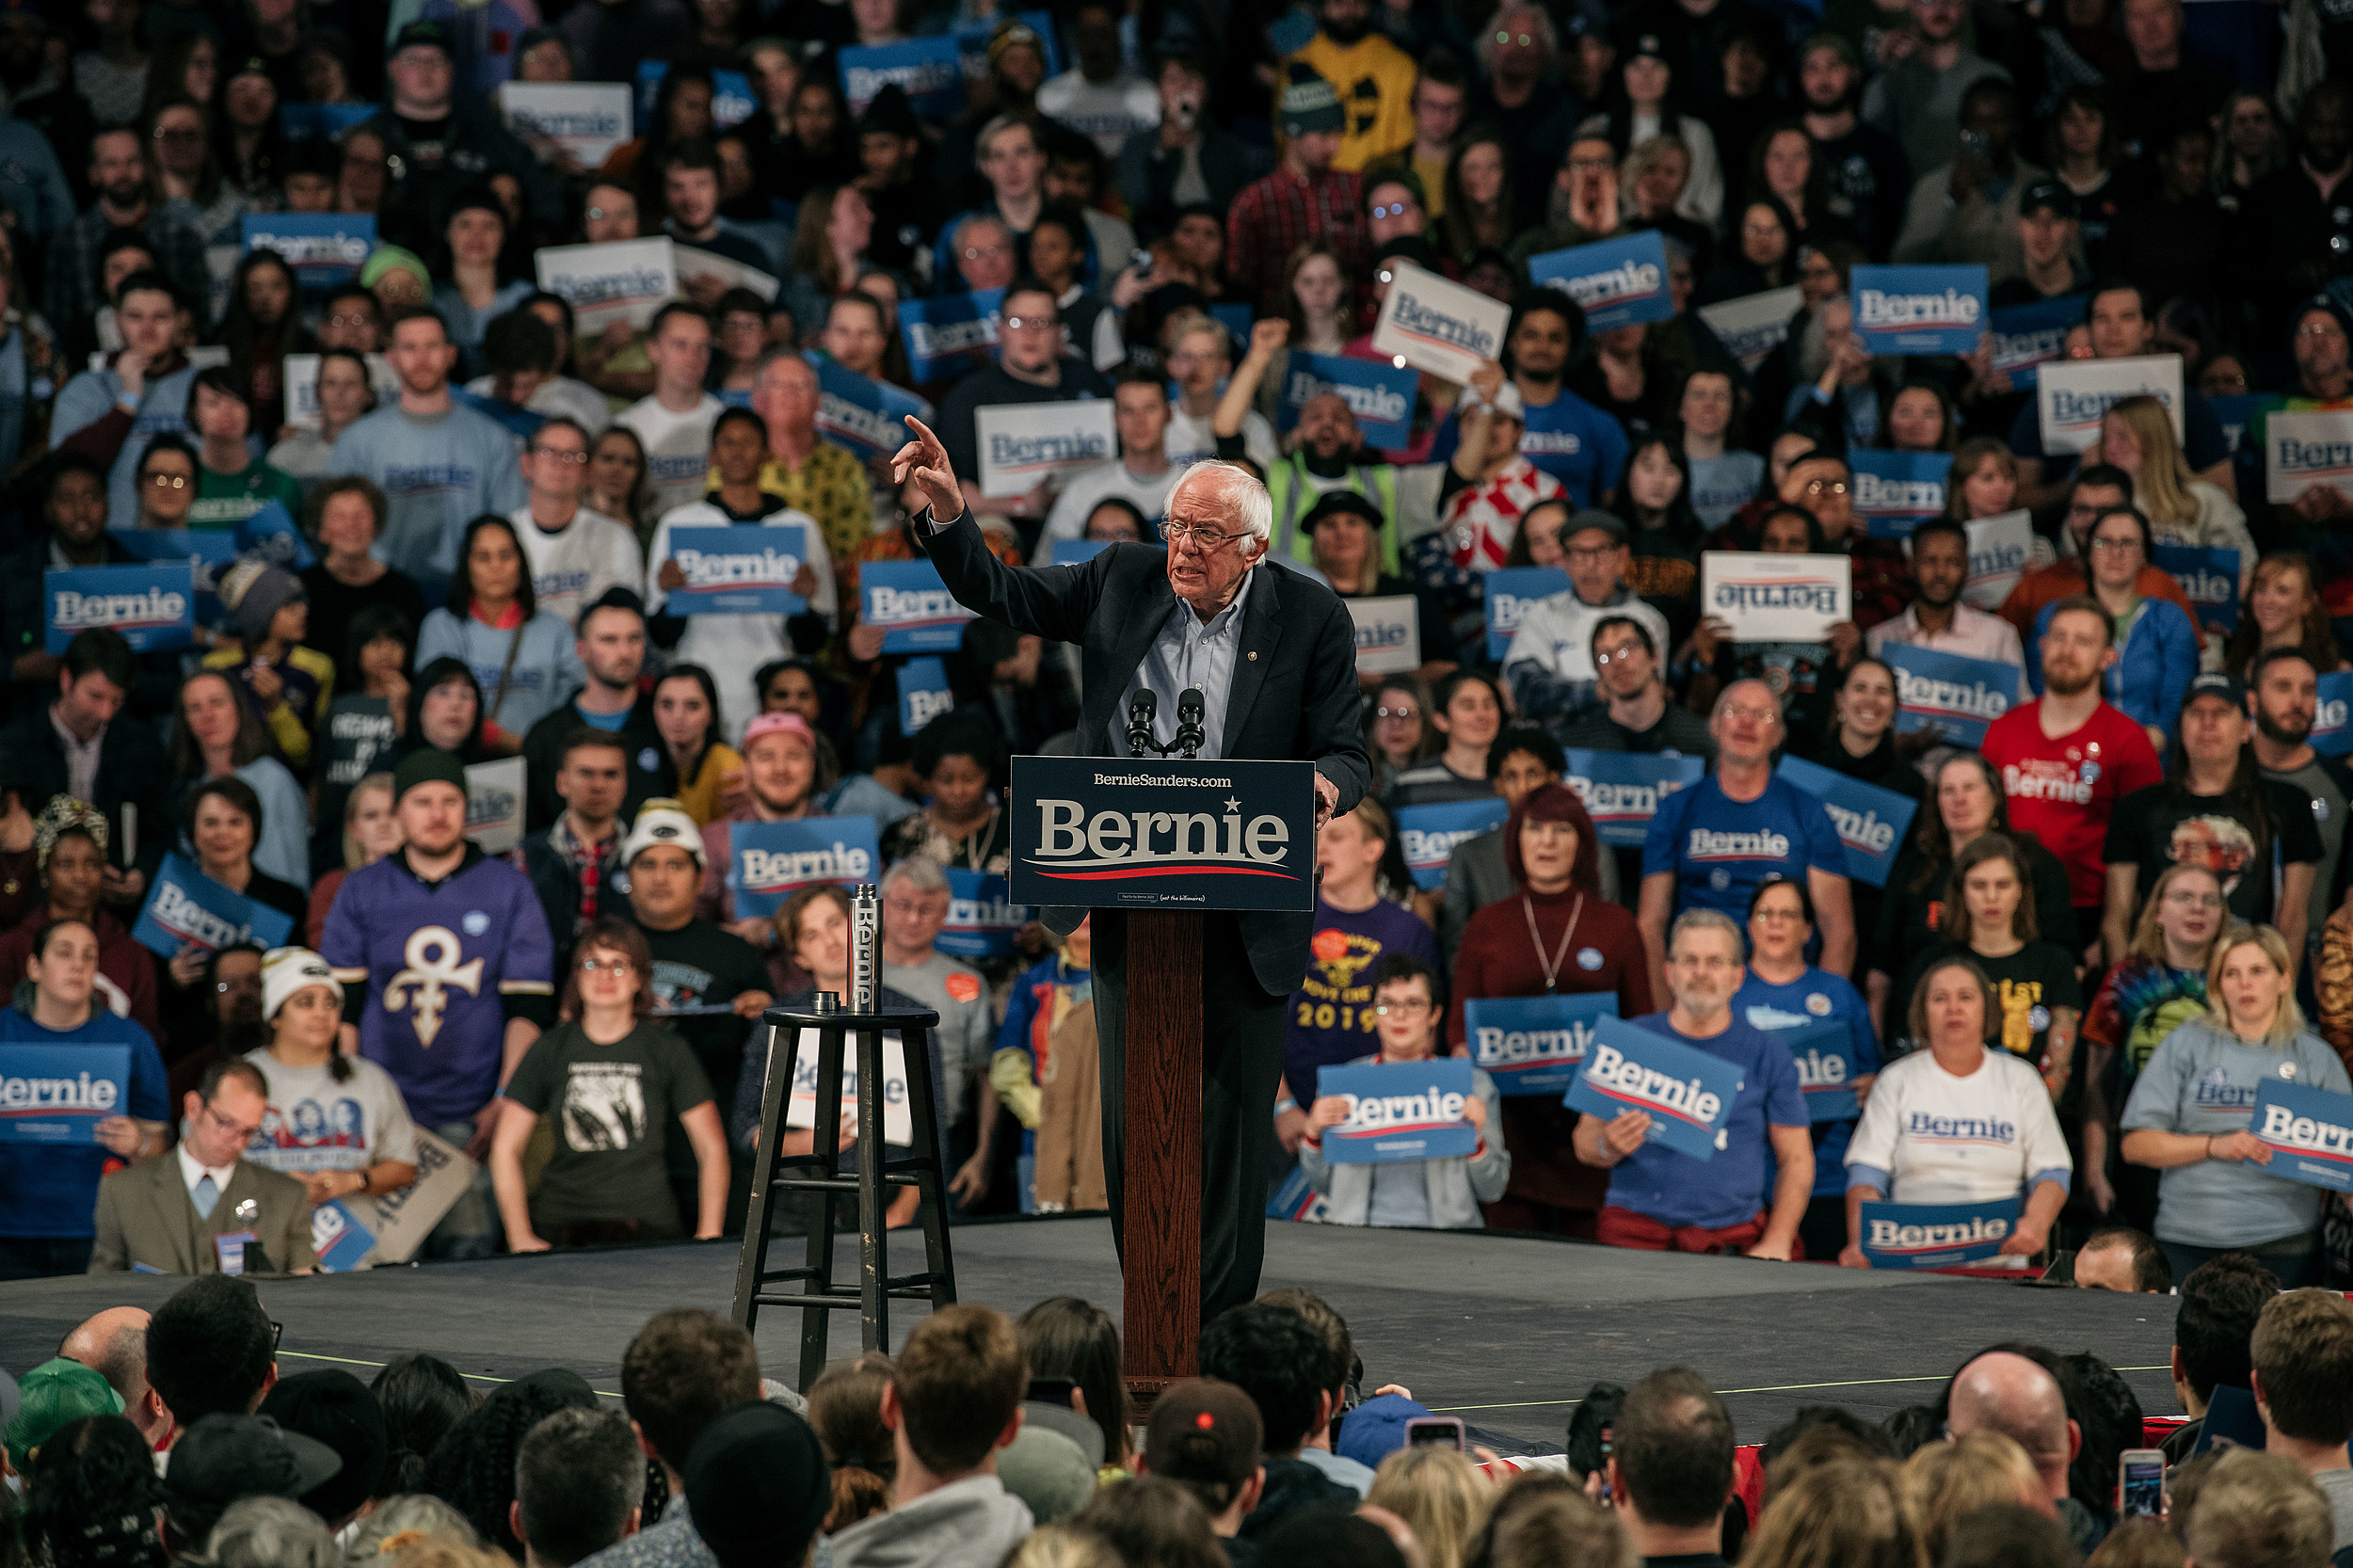 Bernie Sanders Campaign Stop Draws Big Audience at Williams Arena